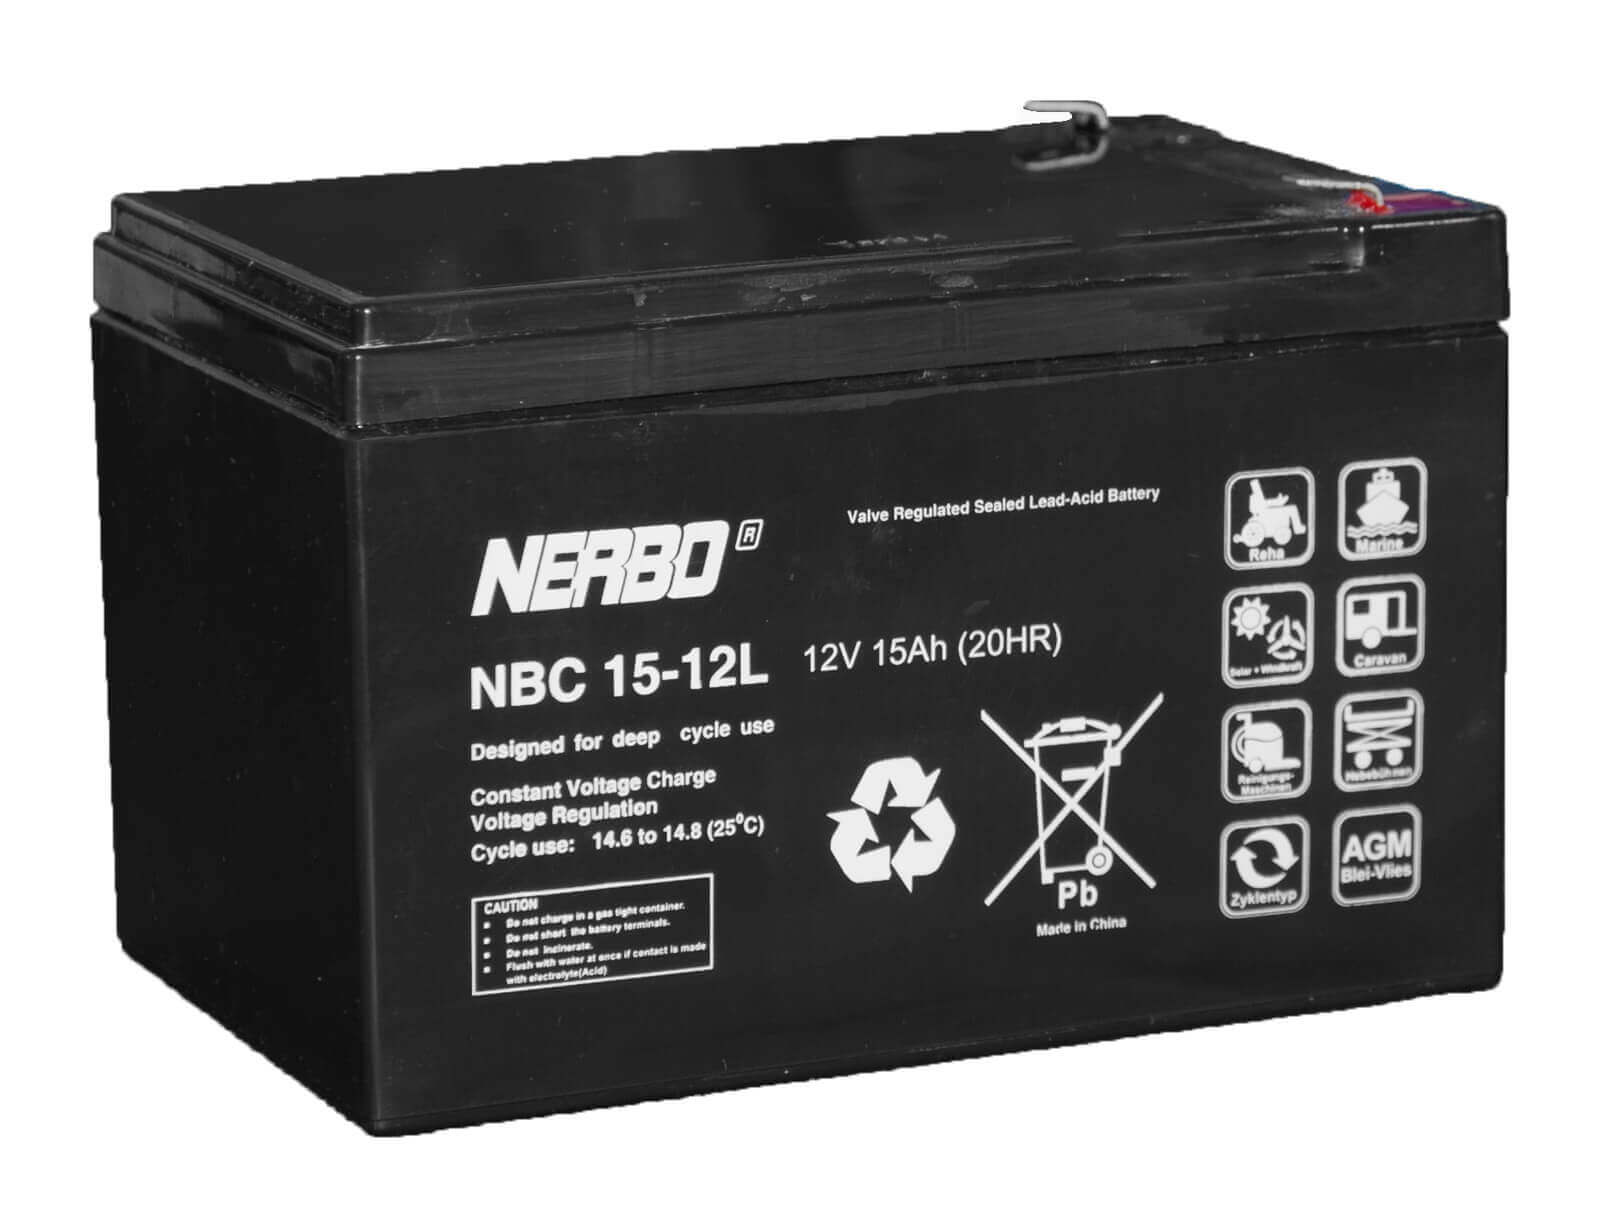 Nerbo NBC 15-12L - 12V 15Ah VRLA-AGM Akku Batterie Zyklentyp